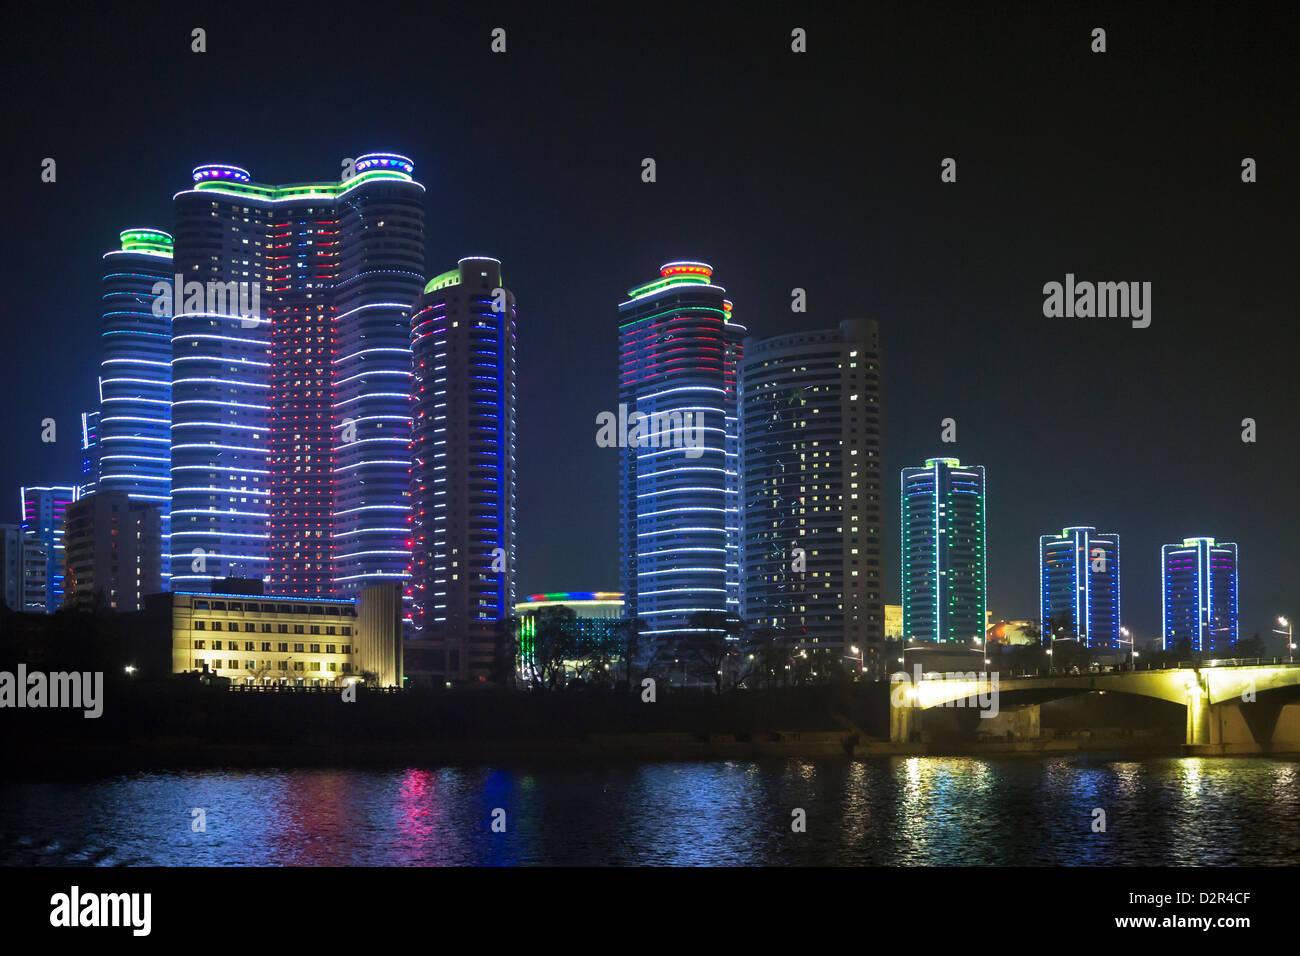 Modern city apartments illuminated at night, Pyongyang, Democratic People's Republic of Korea (DPRK), North - Stock Image